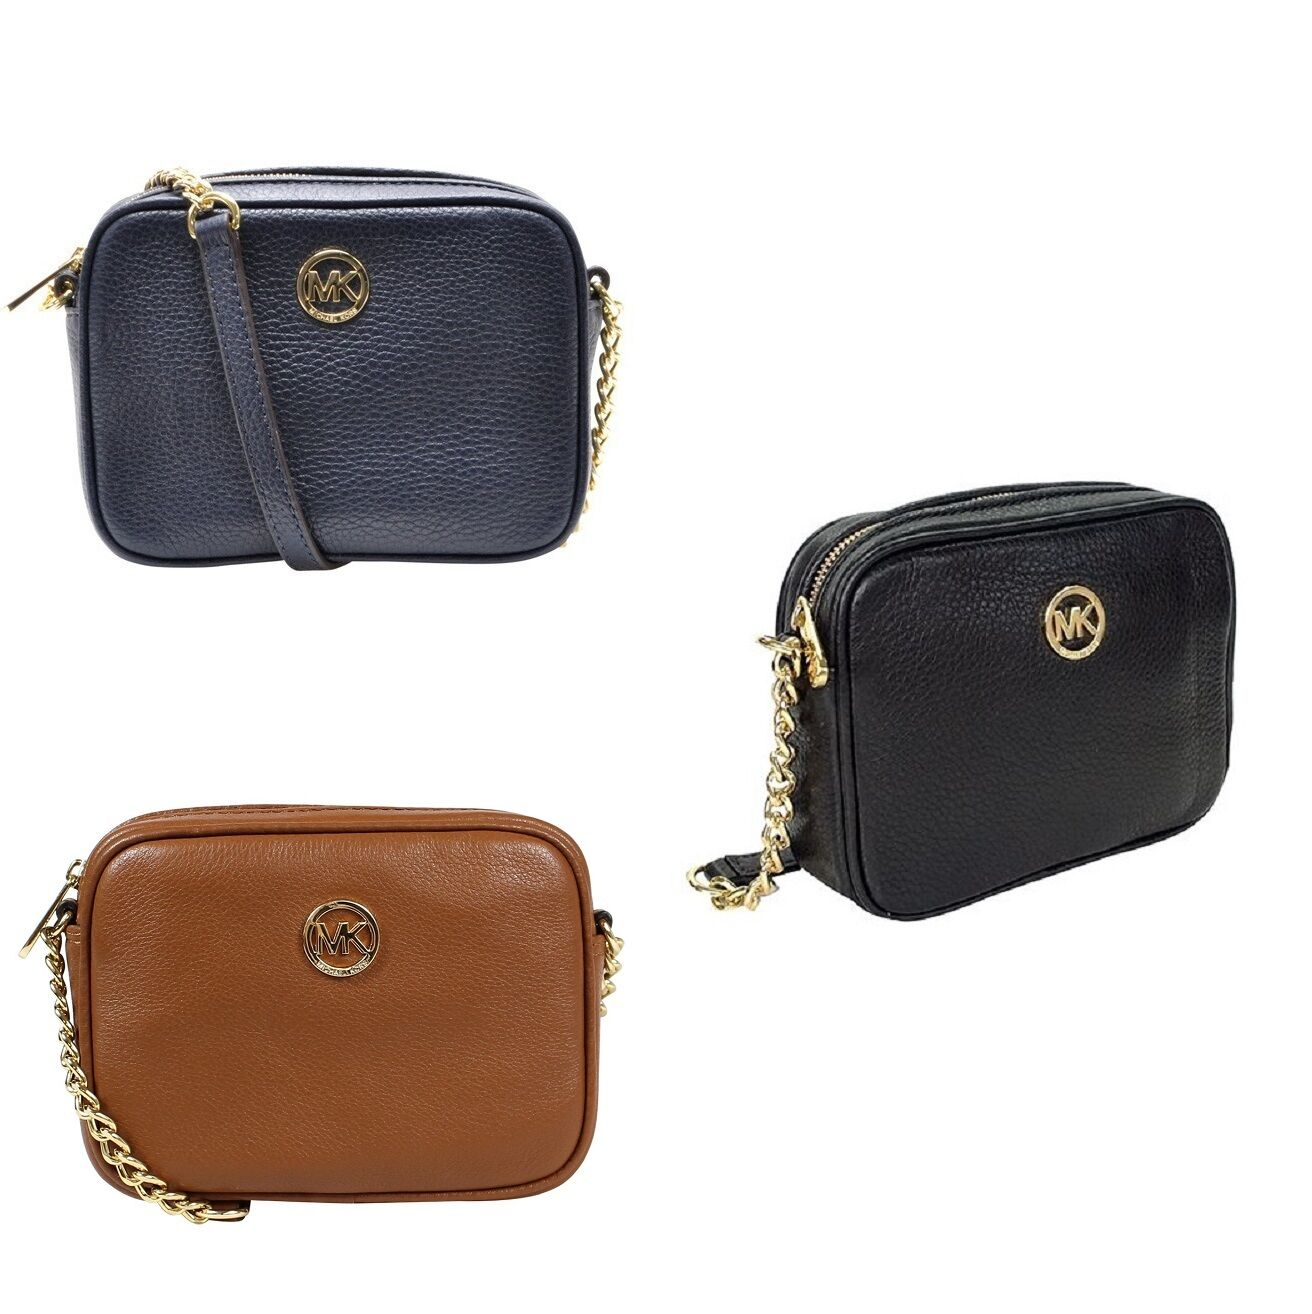 new michael kors fulton small crossbody leather bag in